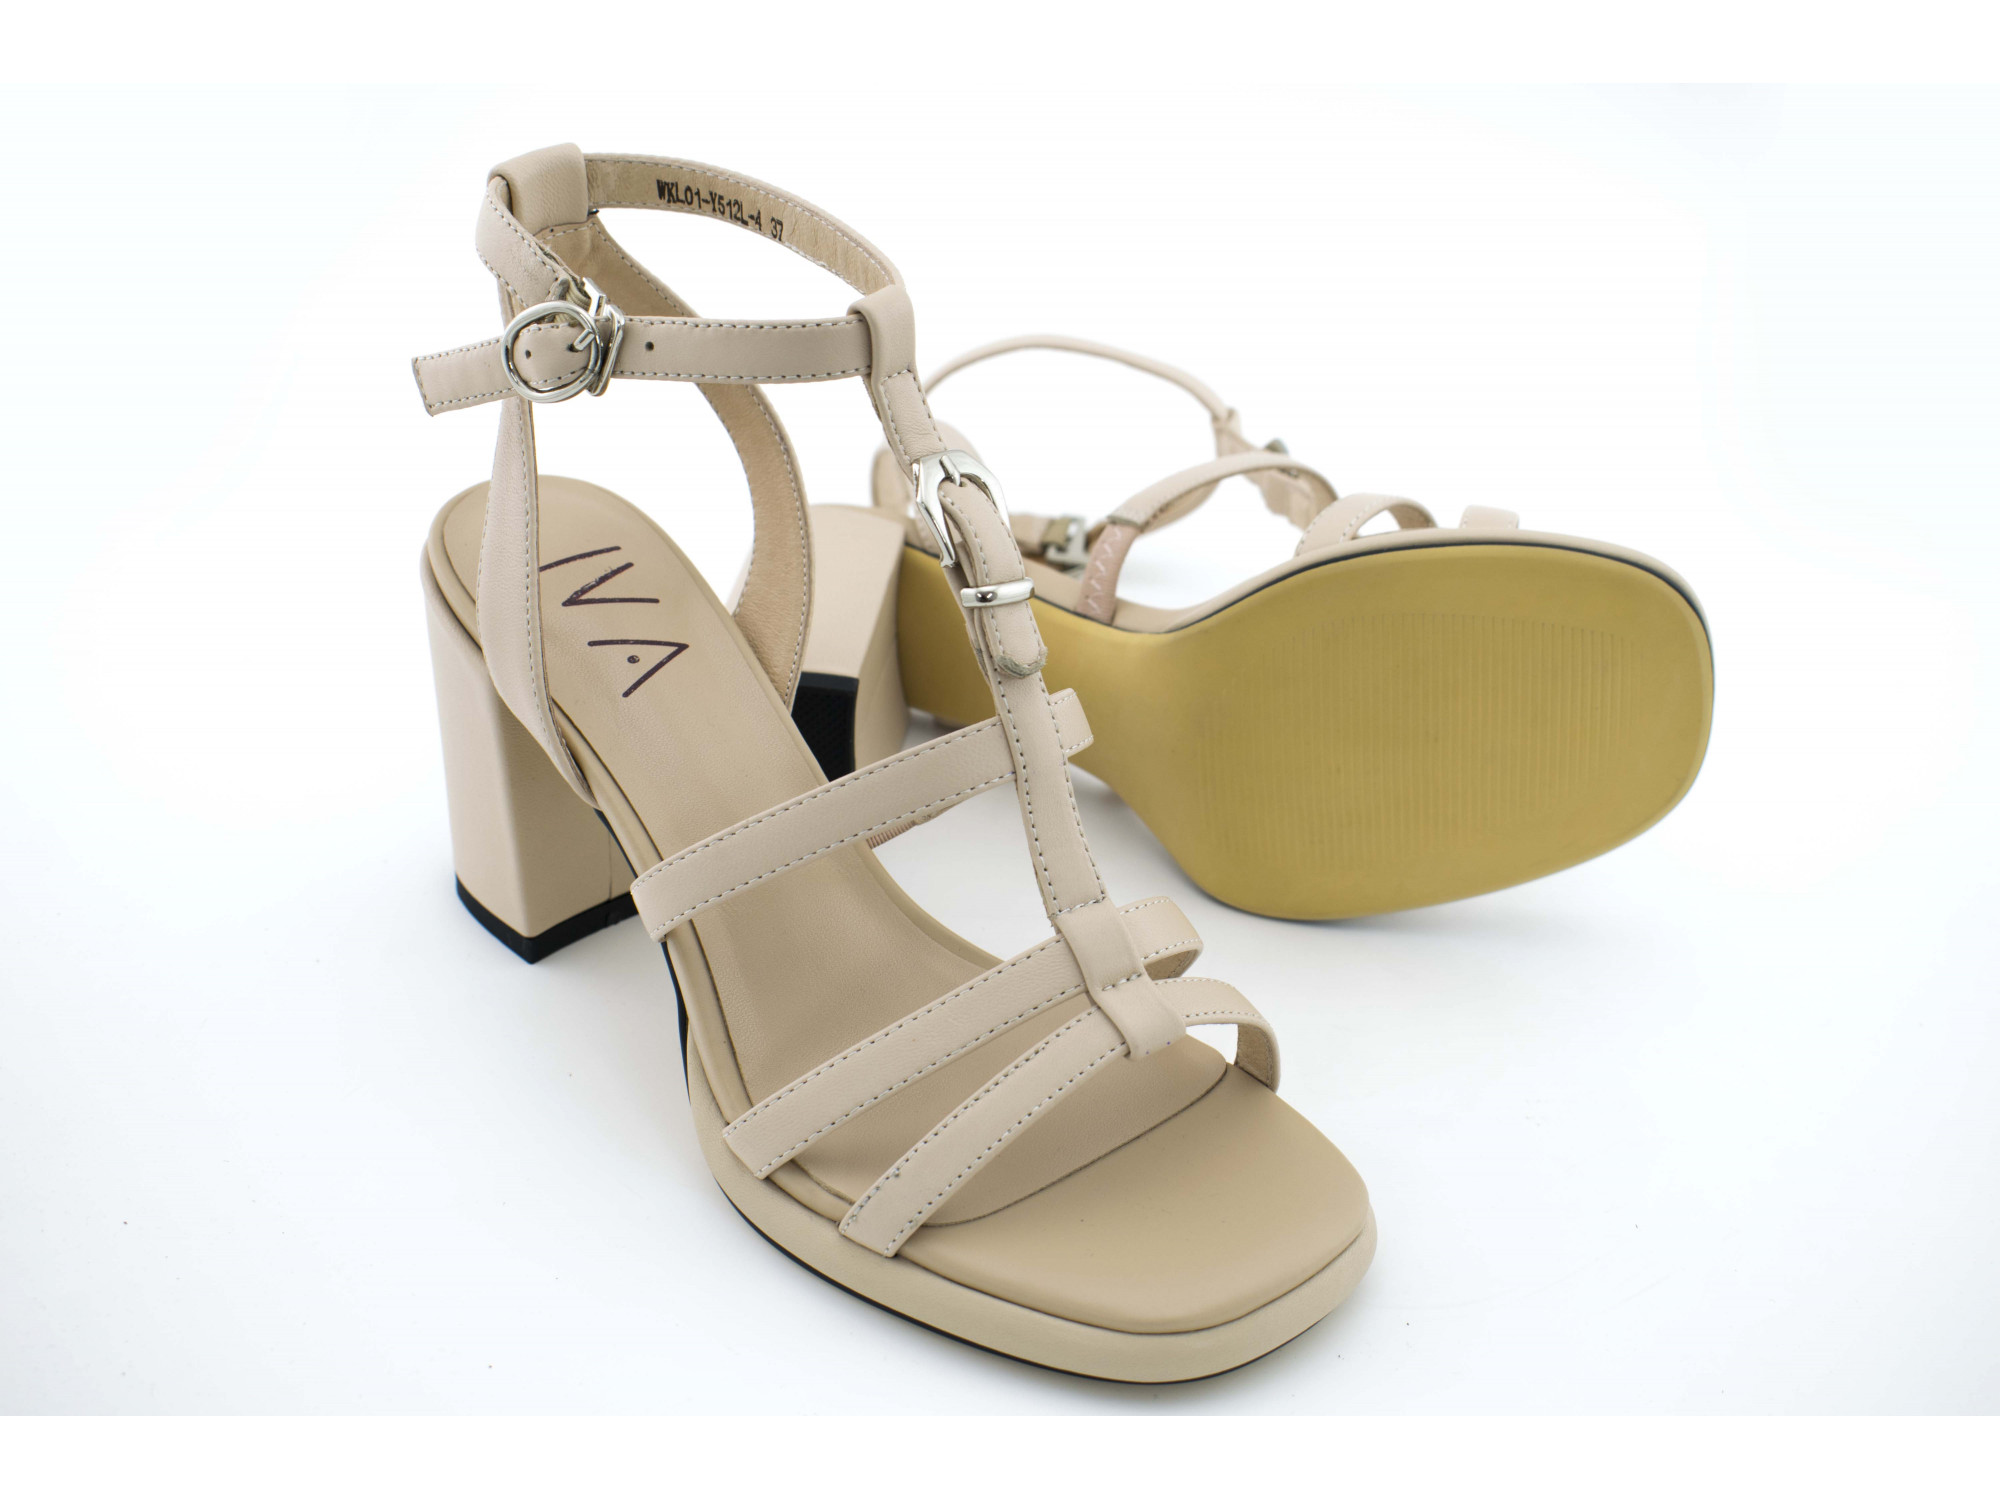 Летние туфли IVA WKL01 Бежевые